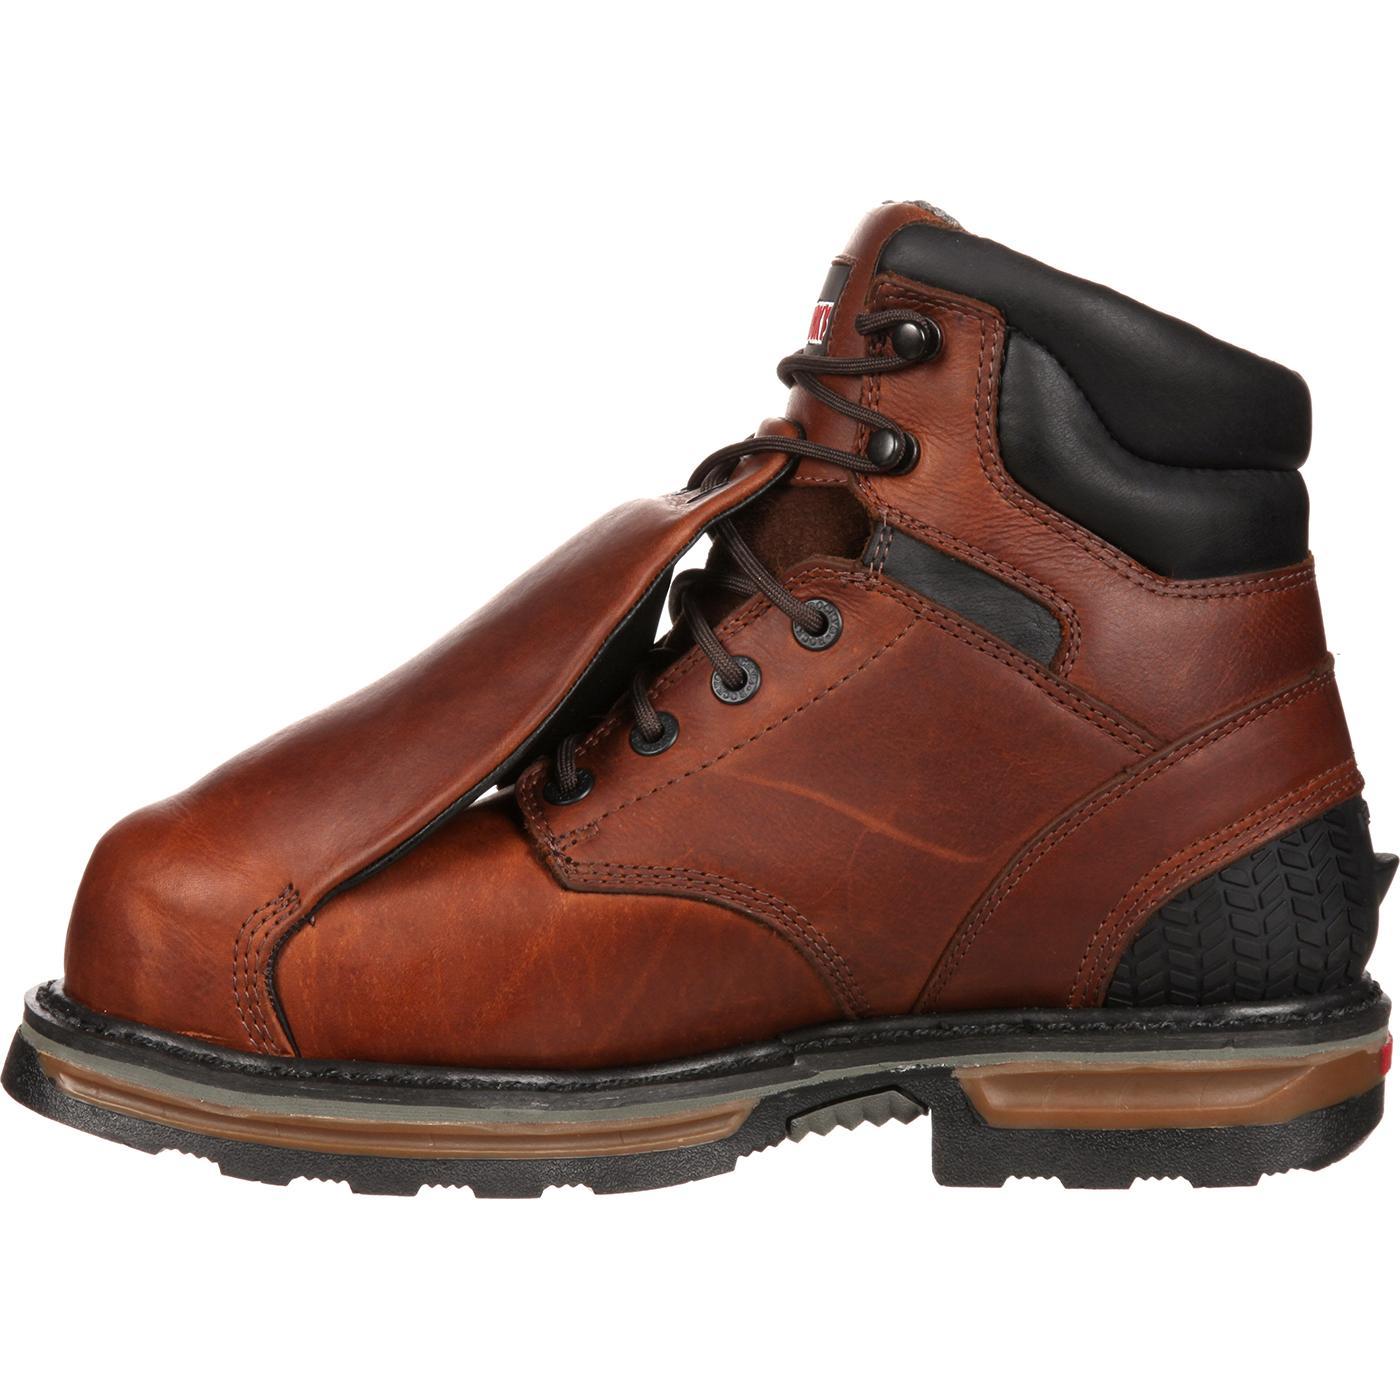 c02408018dc Rocky Elements Steel Waterproof Steel Toe Met-Guard Work Boot